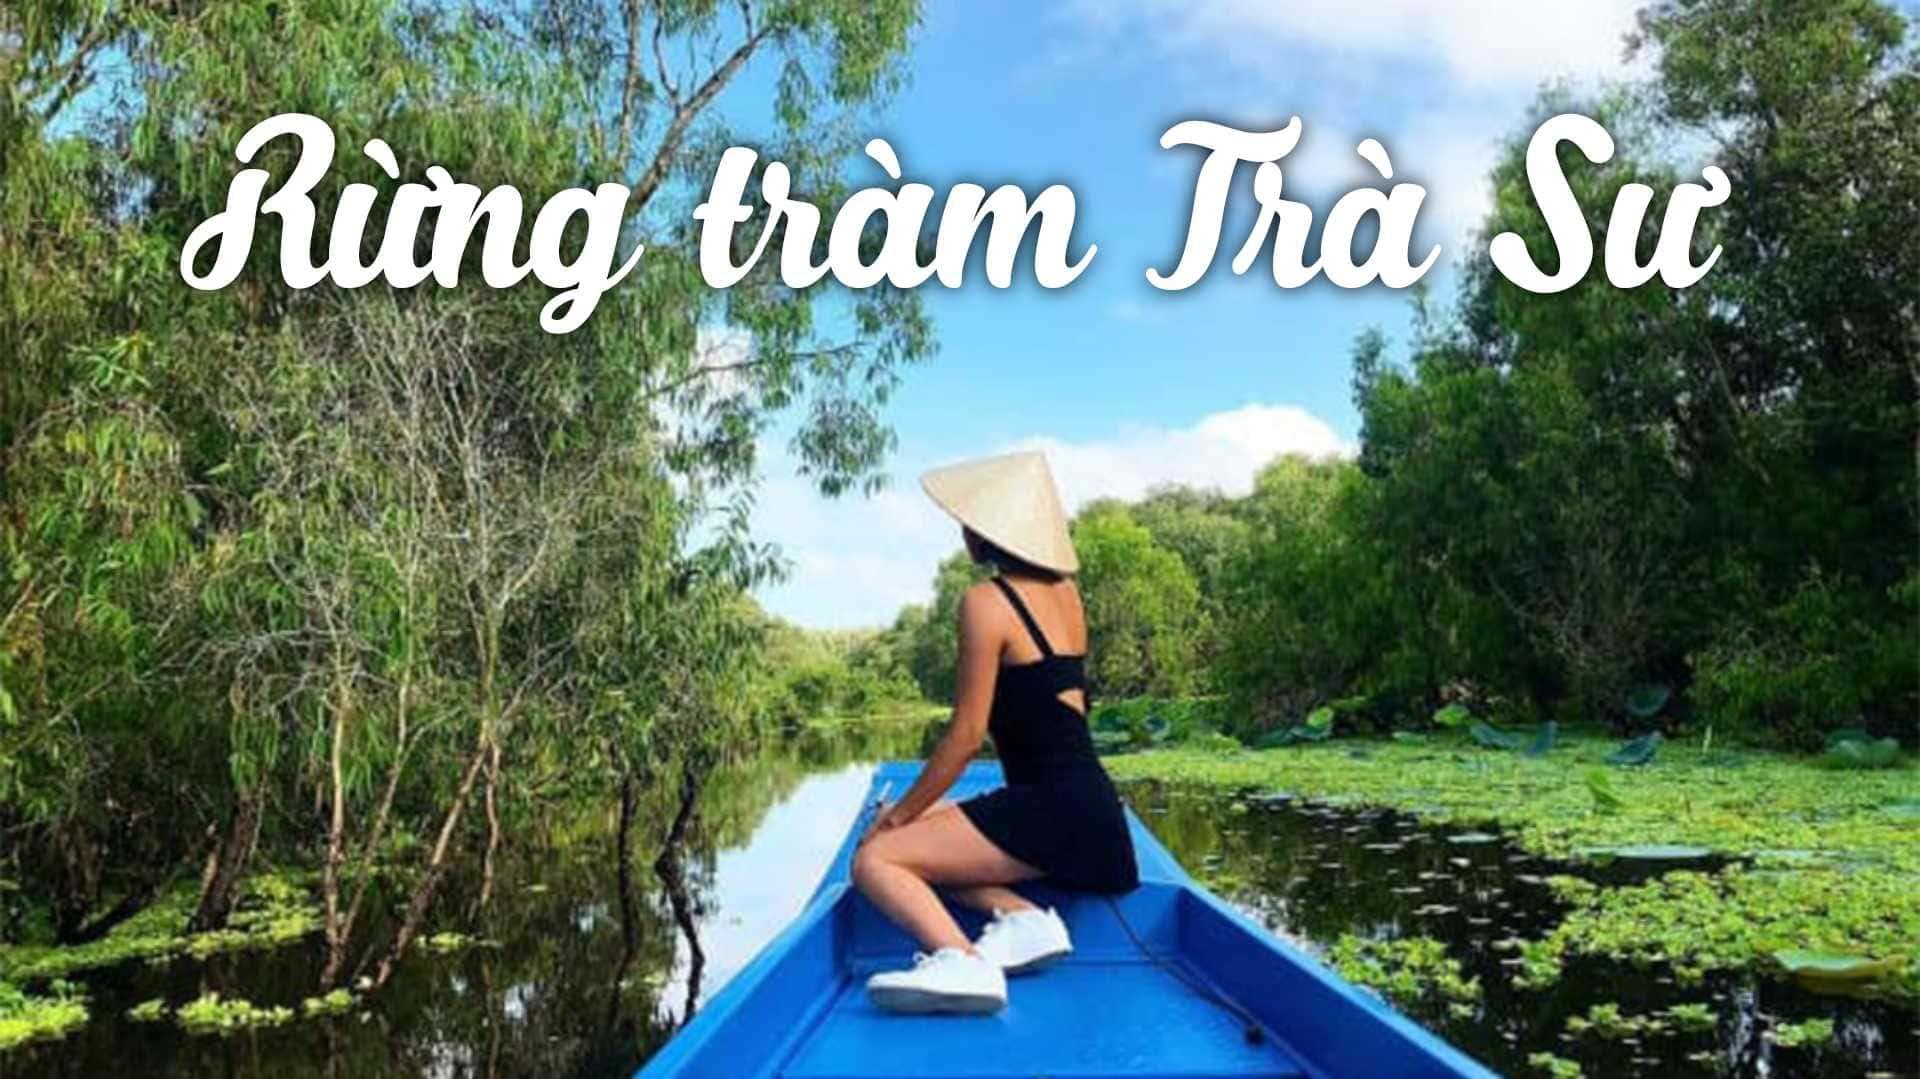 rung-tram-tra-su-du-lich-cung-dam-ban-than